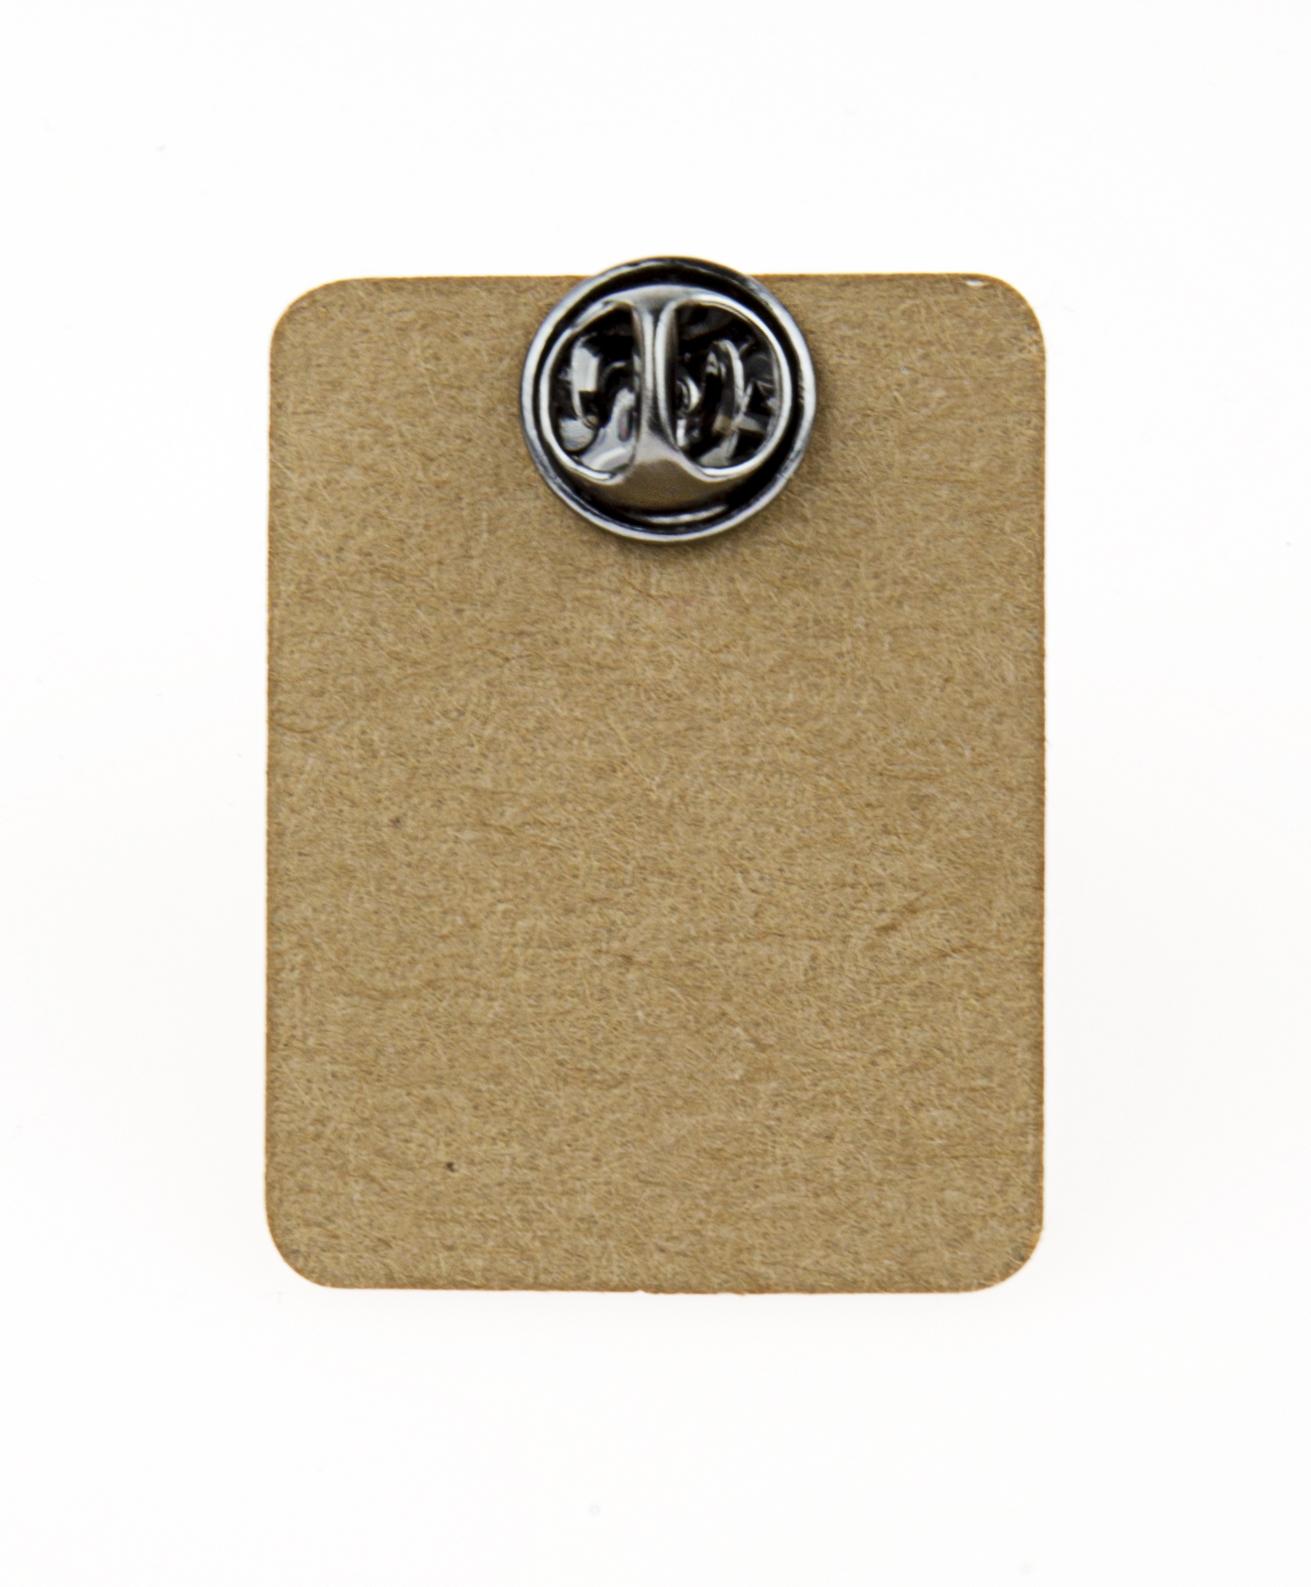 Metal Three Cat Heads Enamel Pin Badge